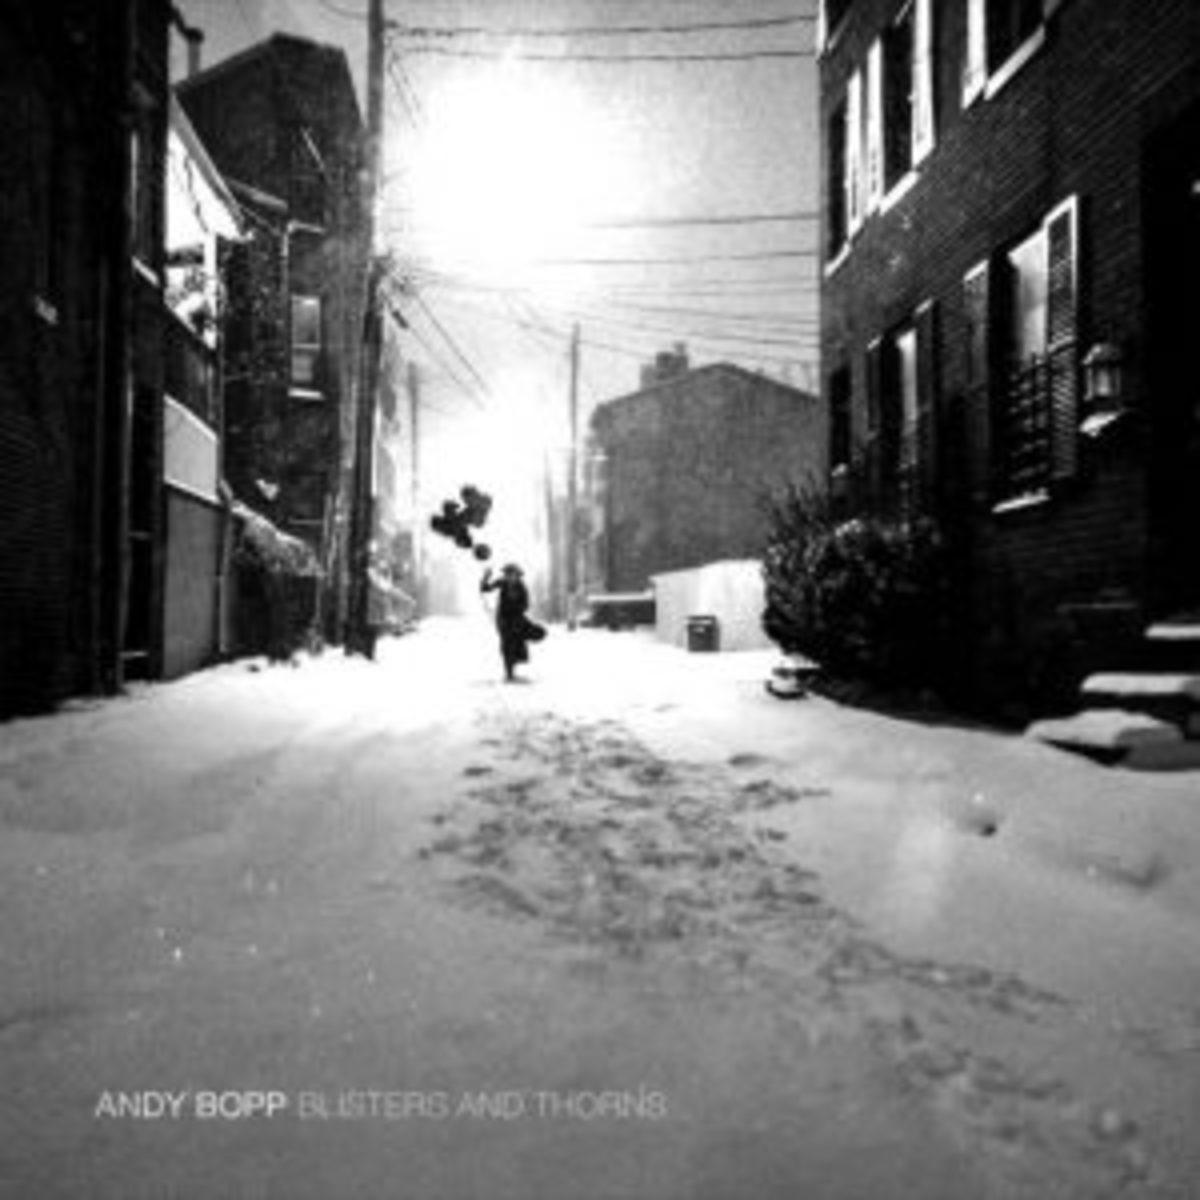 ANDY BOPP